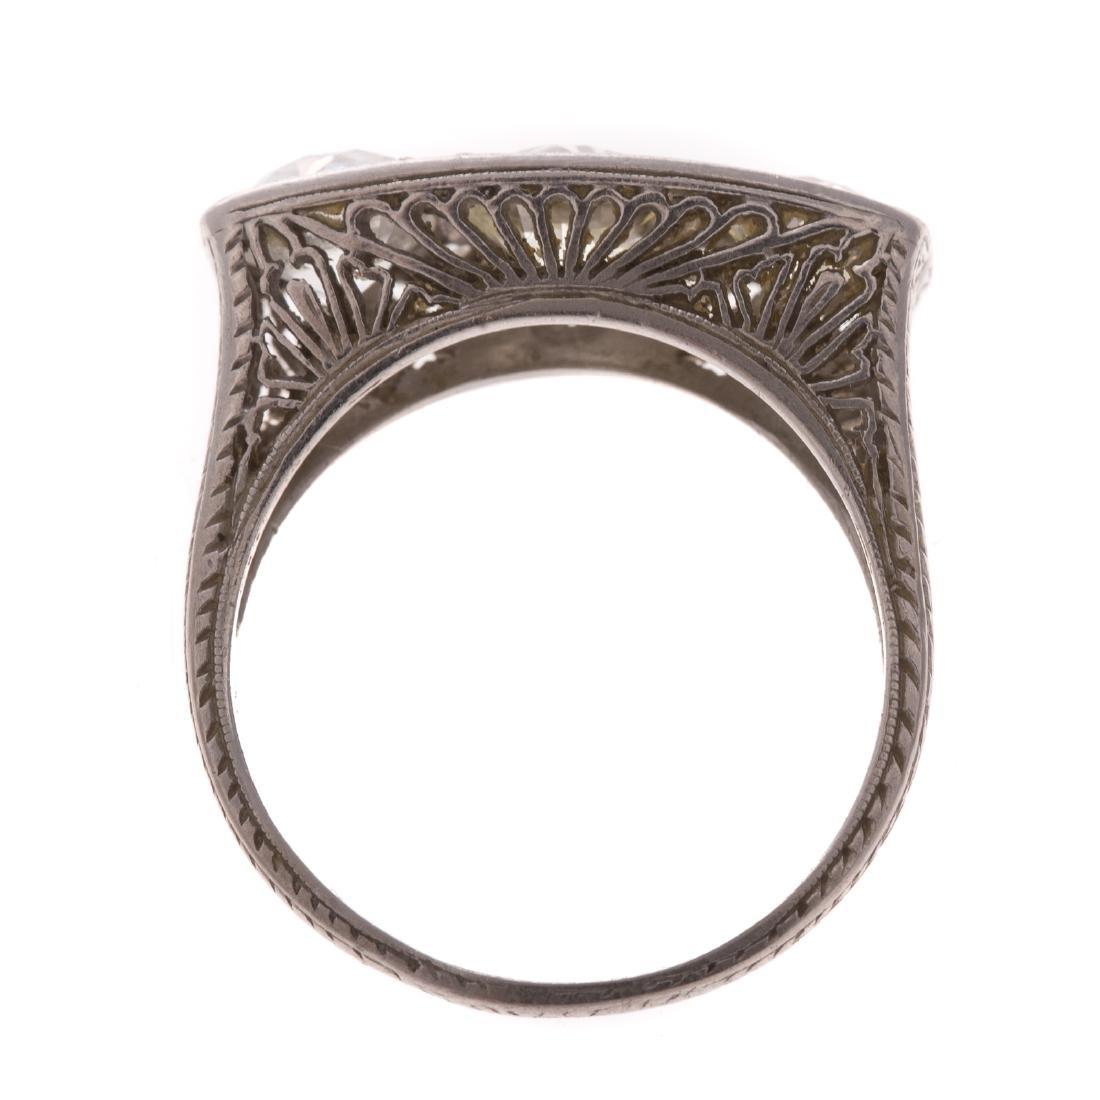 An Art Deco Filigree Diamond Ring in Platinum - 3